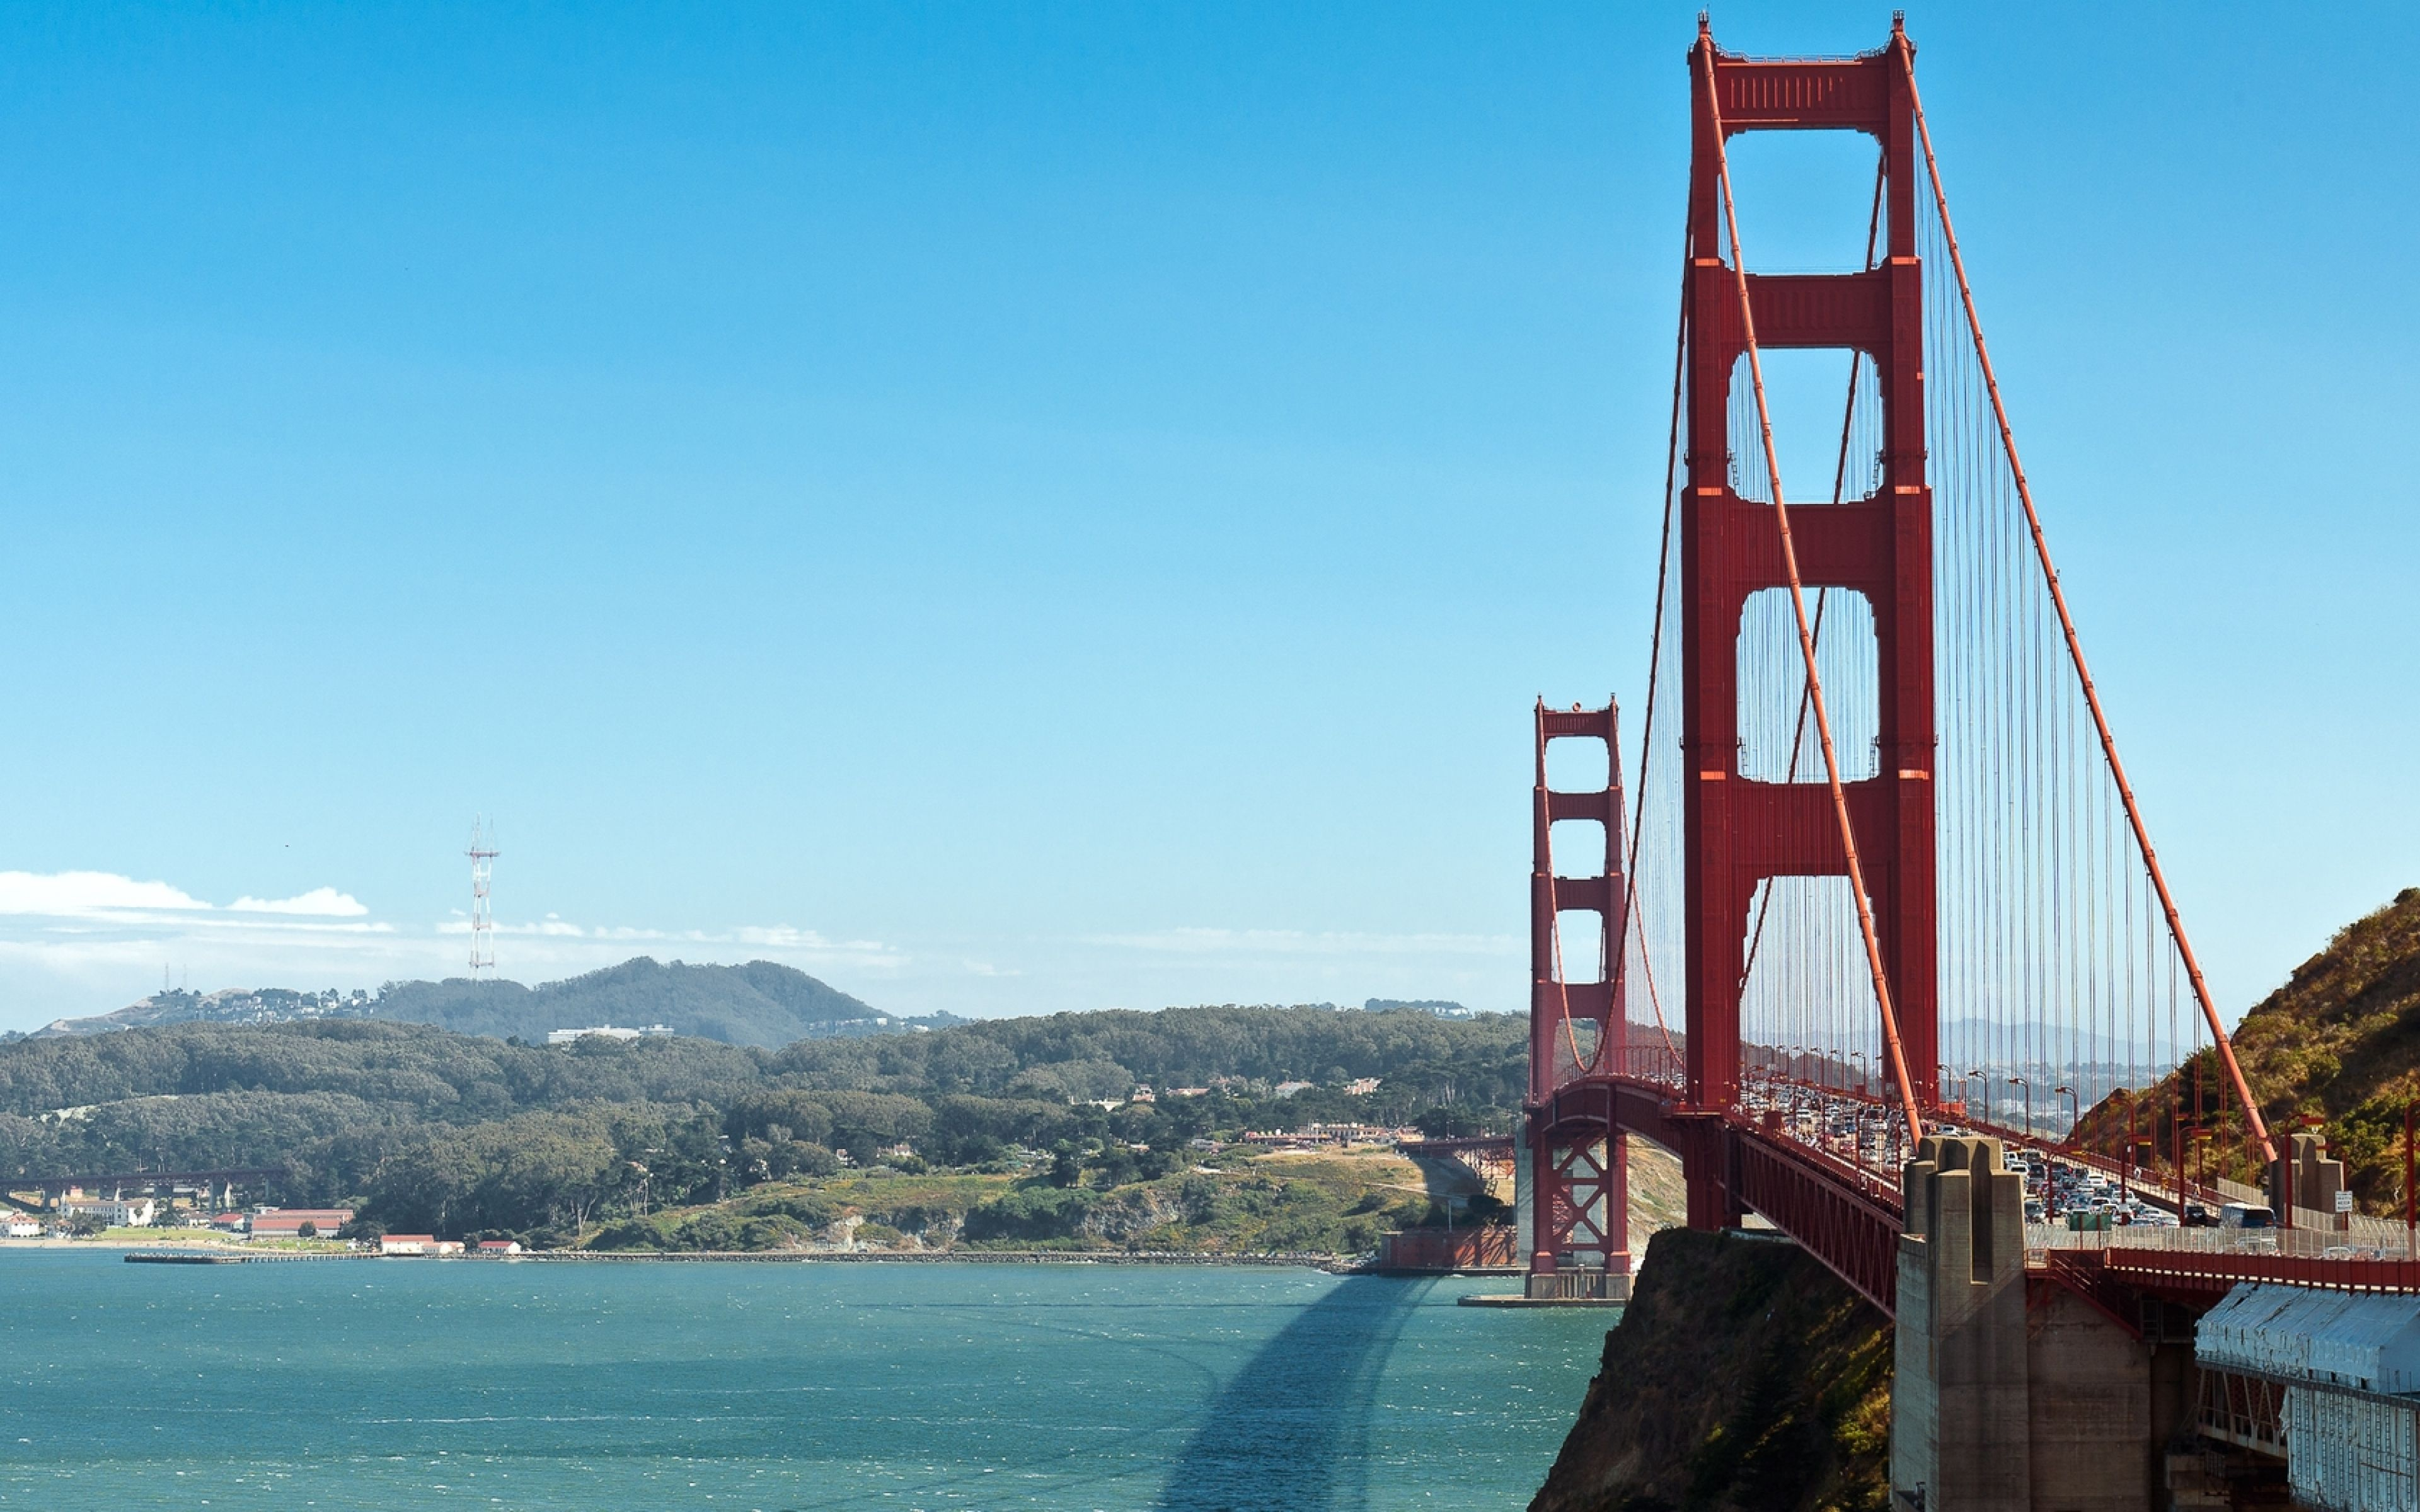 Nice Golden Gate Laptop Backgrounds wallpaper nature and landscape